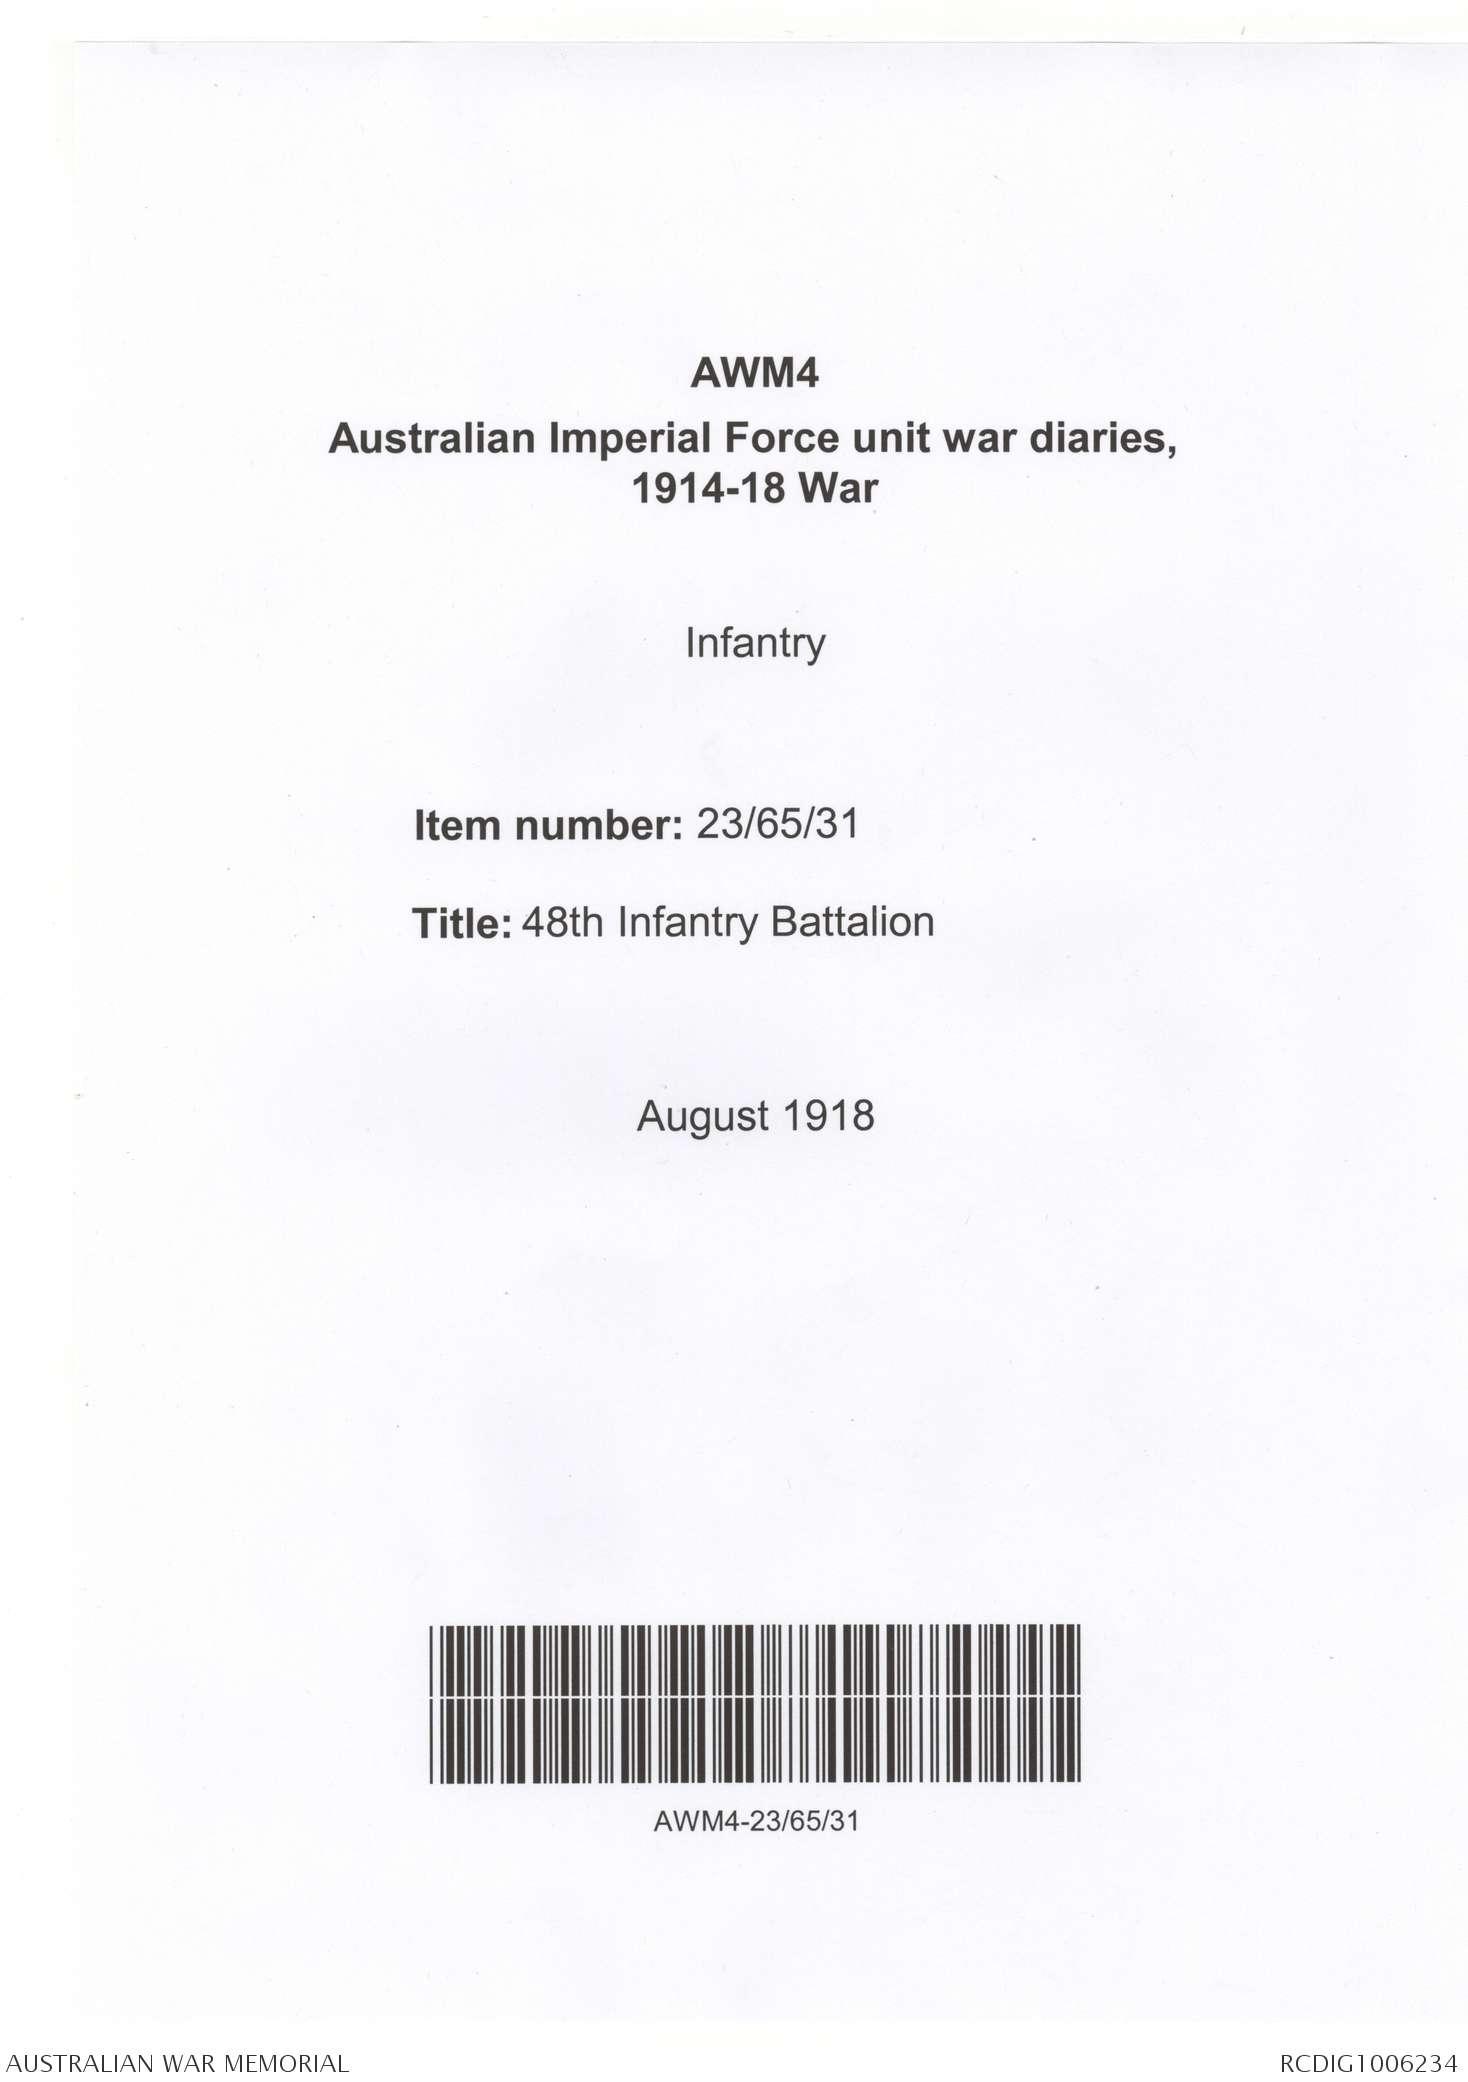 AWM4 23/65/31 - August 1918 | The Australian War Memorial